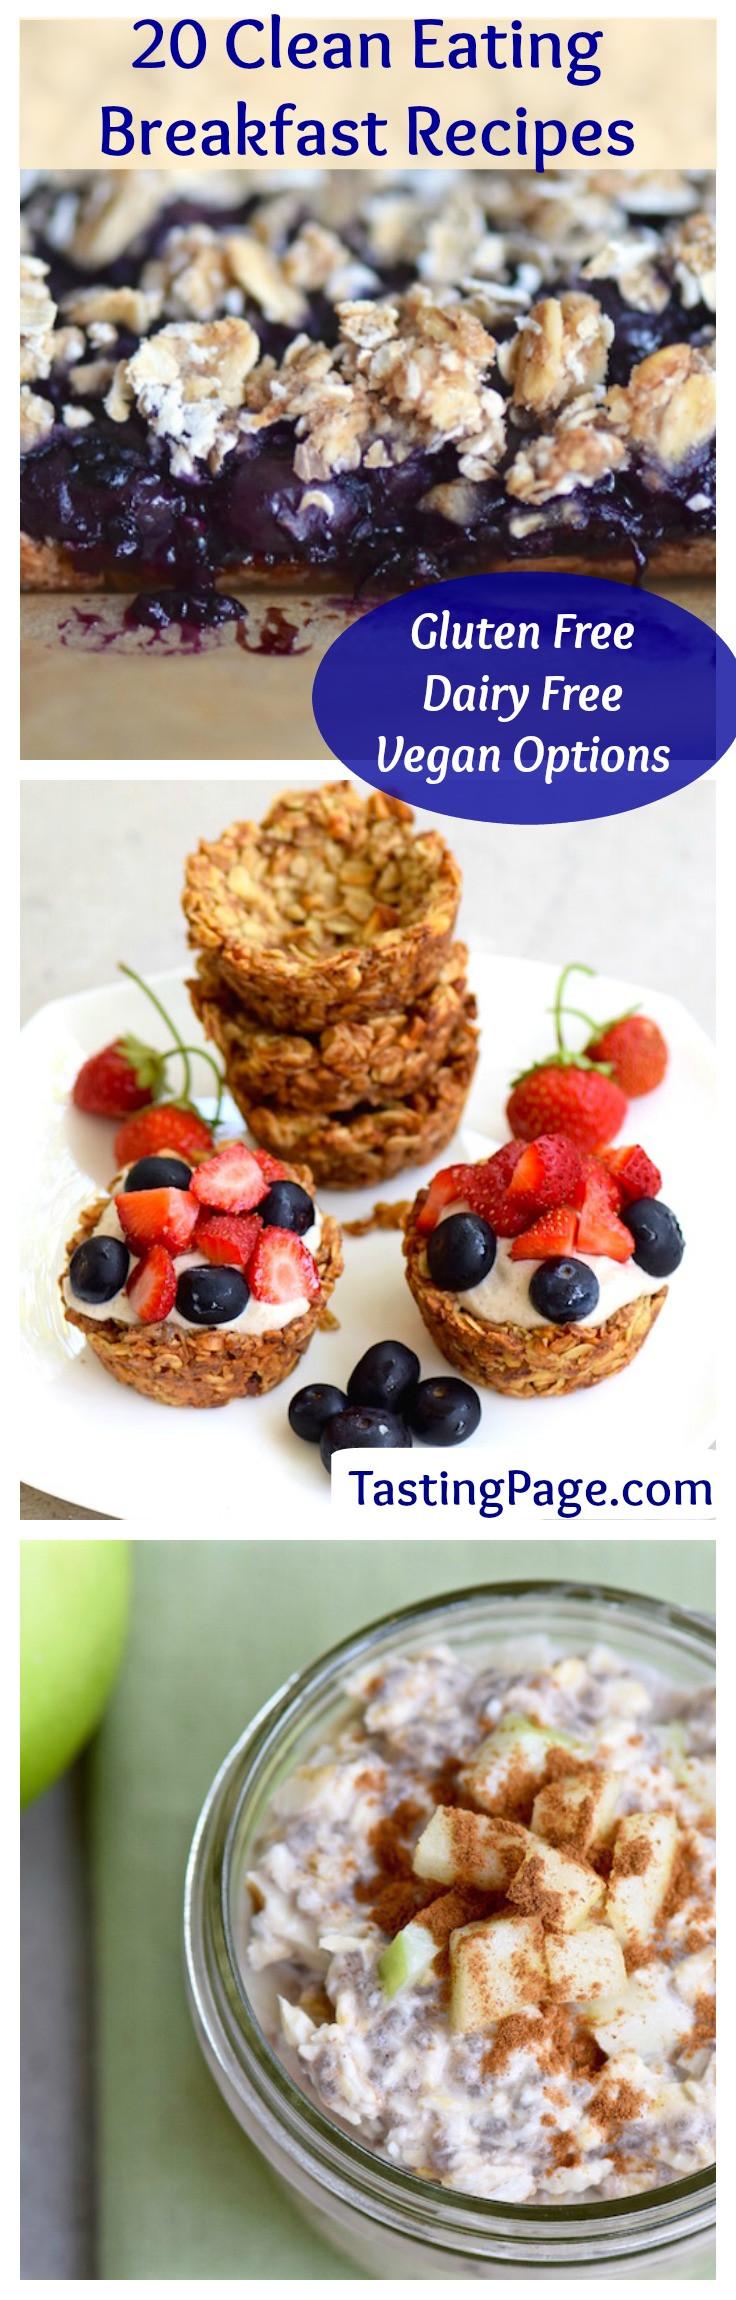 Clean Eat Breakfast Recipes  20 Clean Eating Breakfast Recipes — Tasting Page